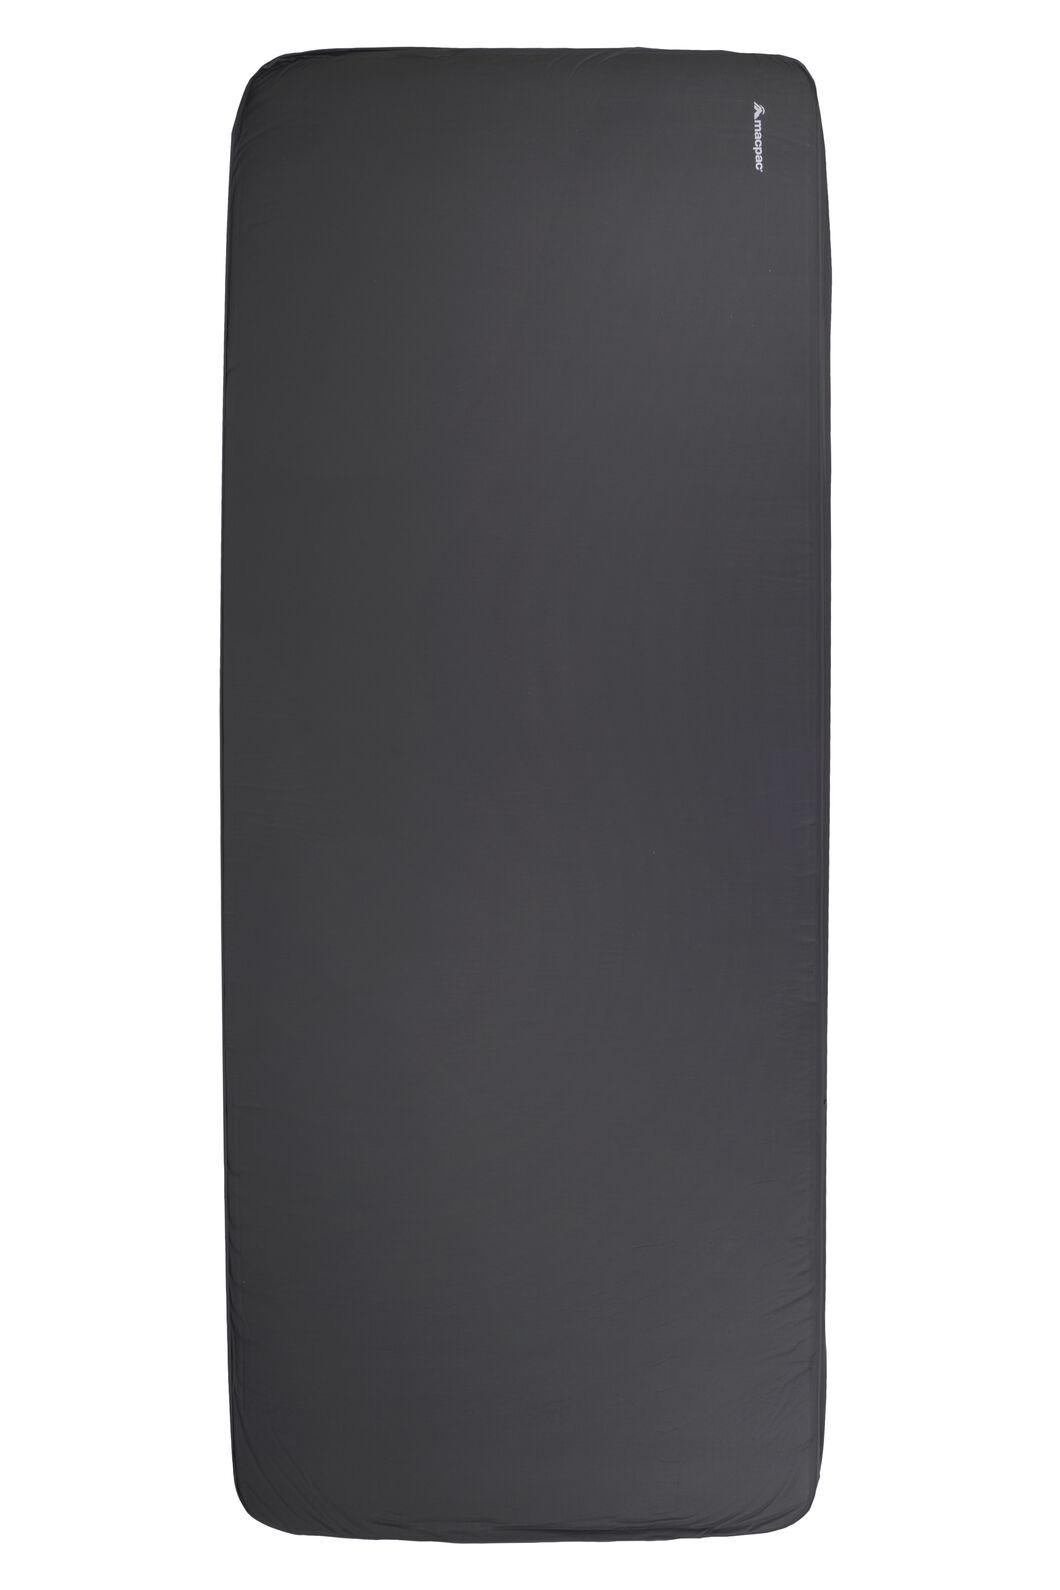 Macpac Deluxe Single Sleeping Mat, Charcoal, hi-res